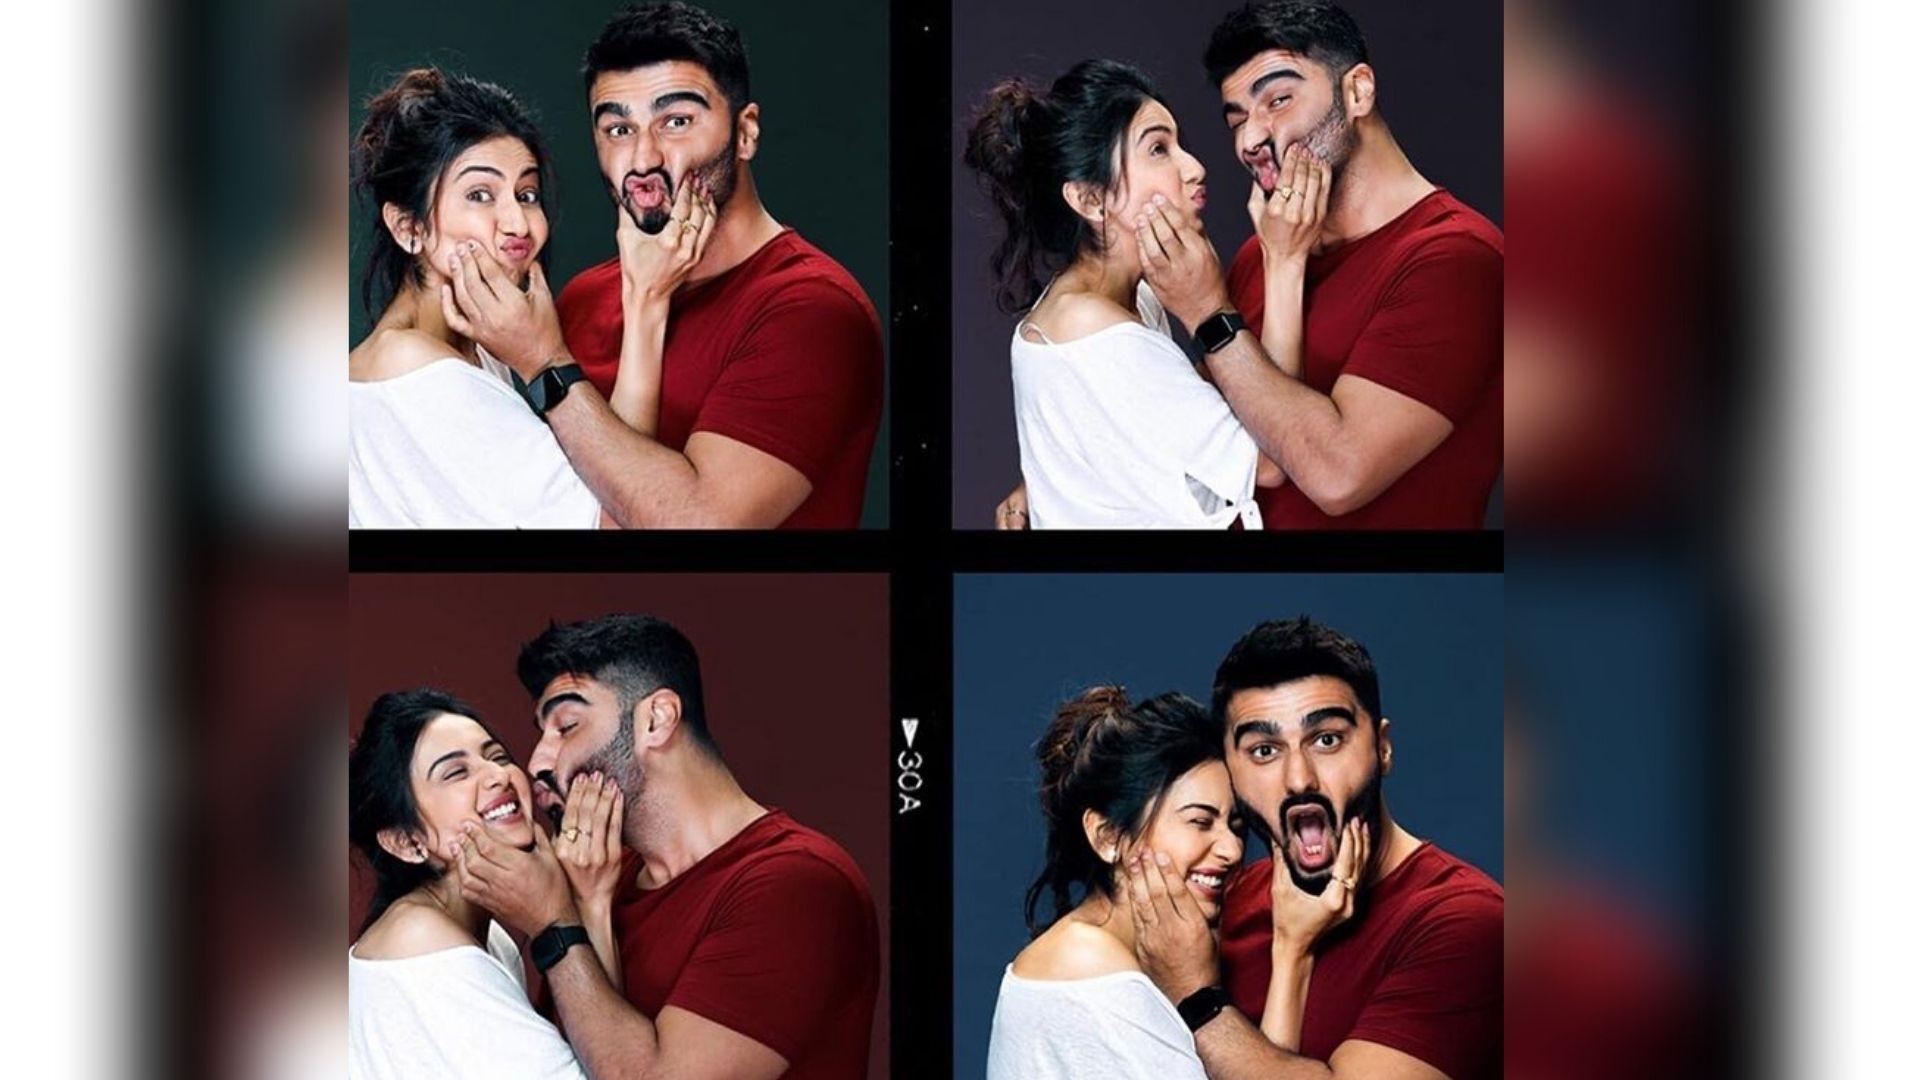 Arjun and Rakul Preet Begin Shooting for a Cross-Border Love Story